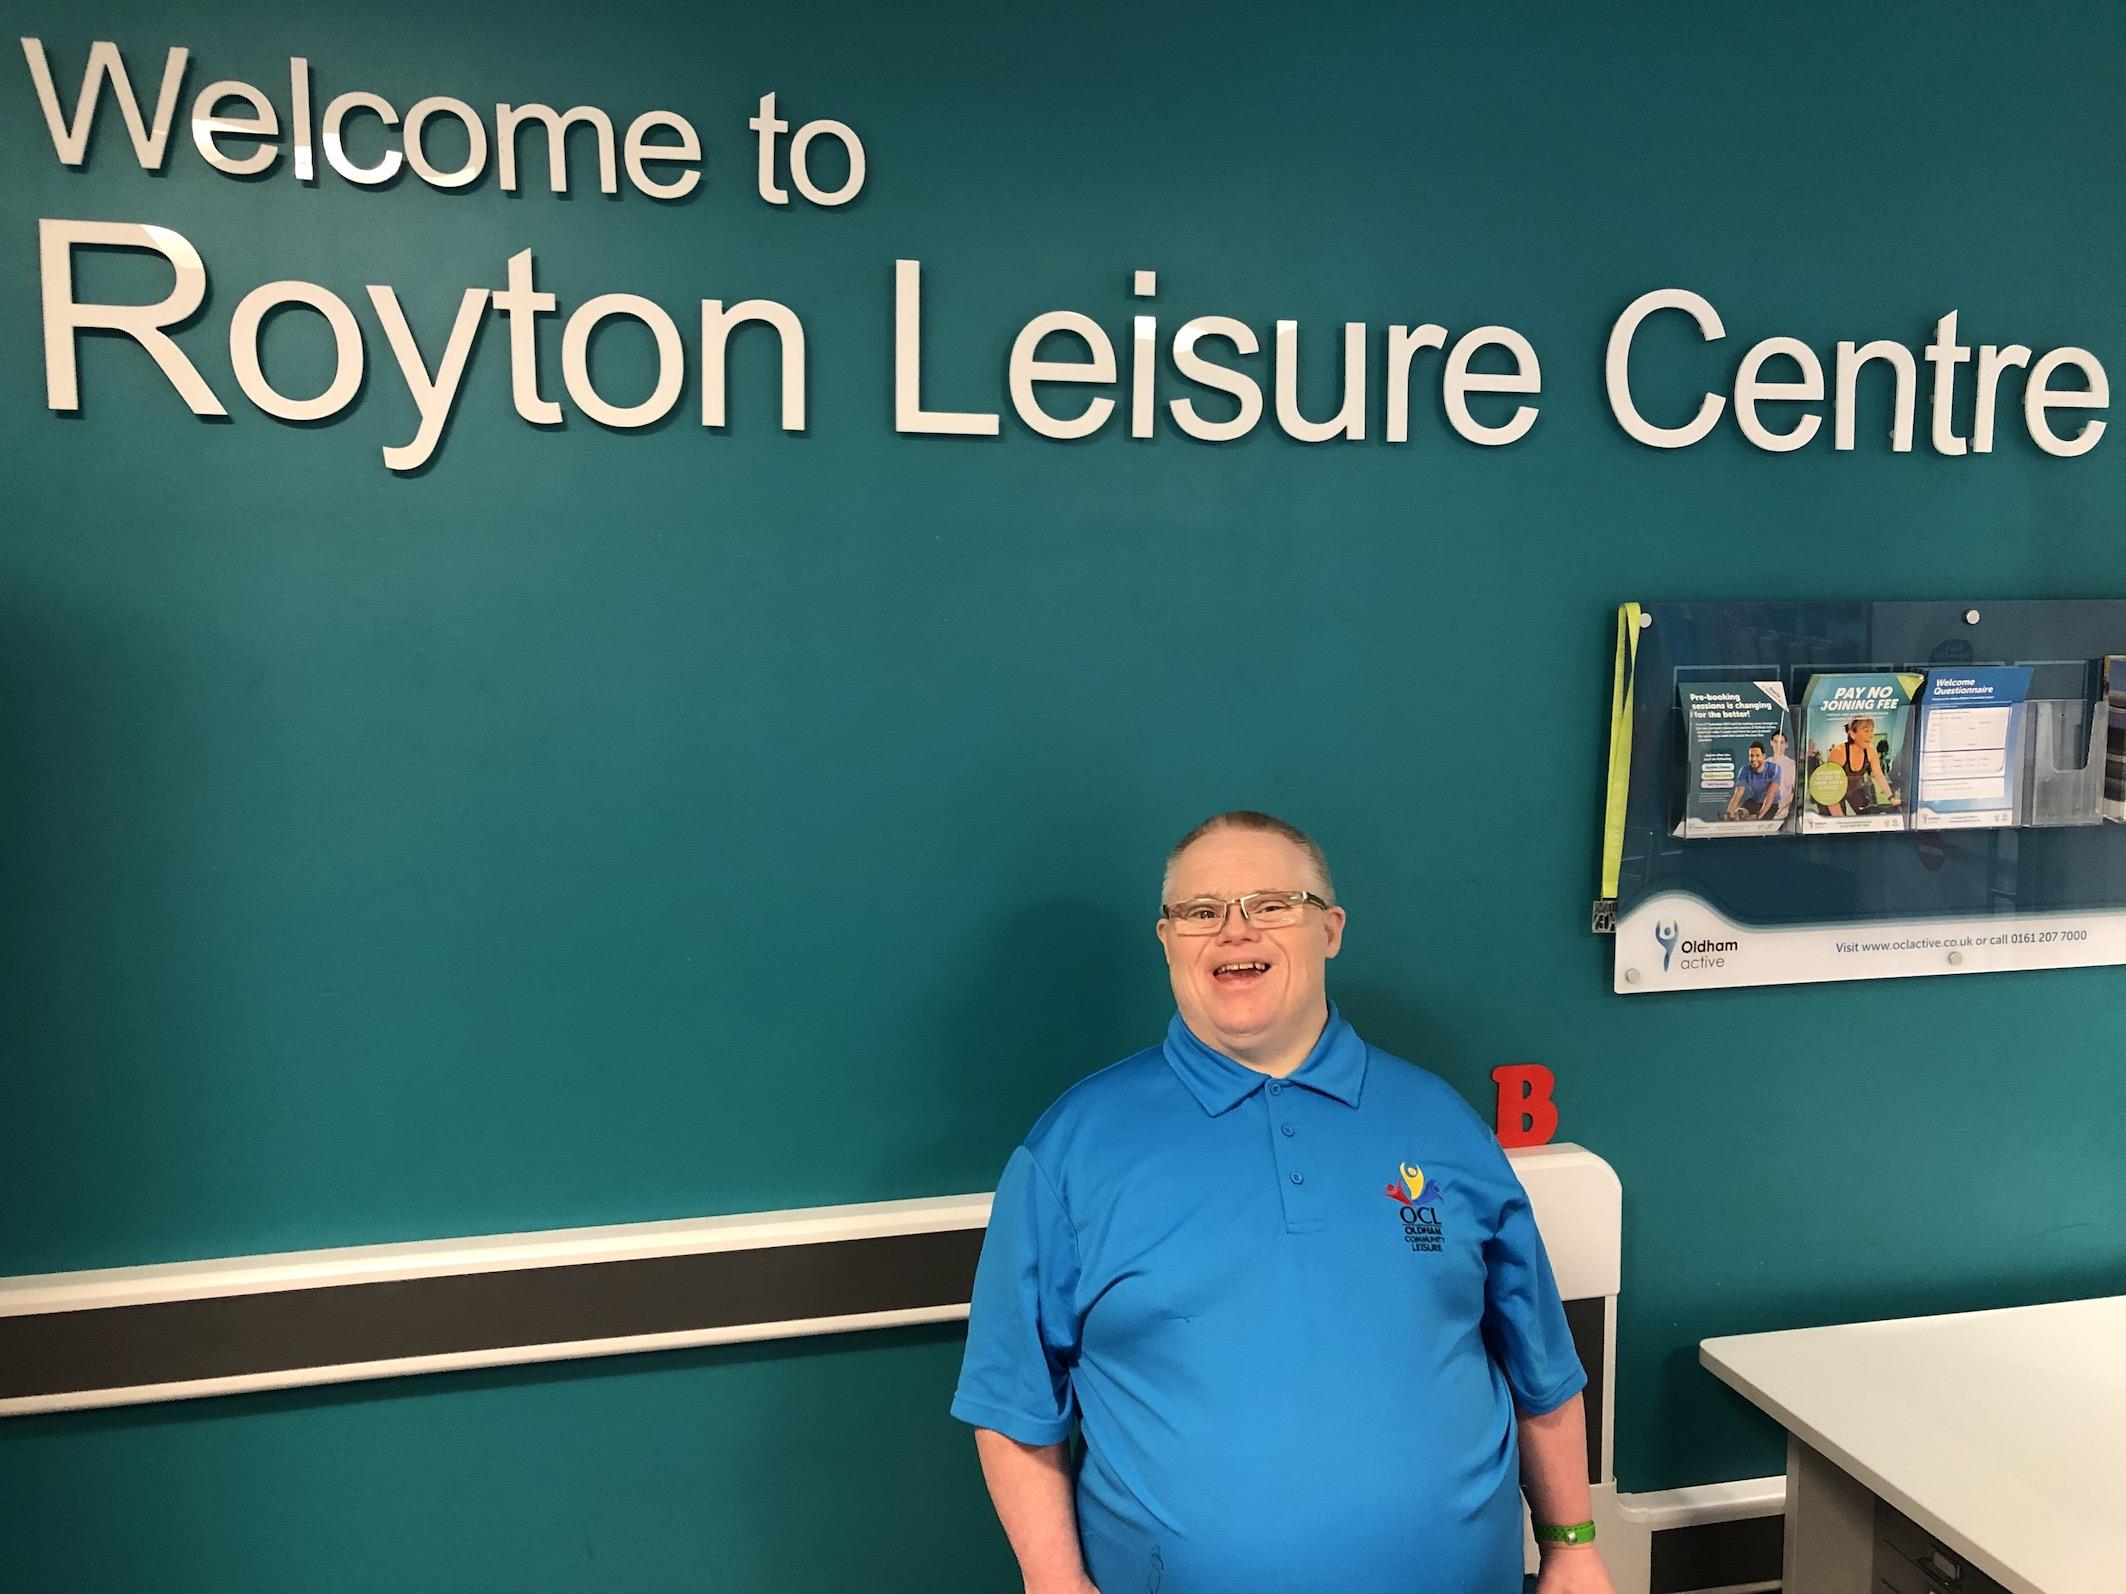 John Carhart at Royton Leisure Centre